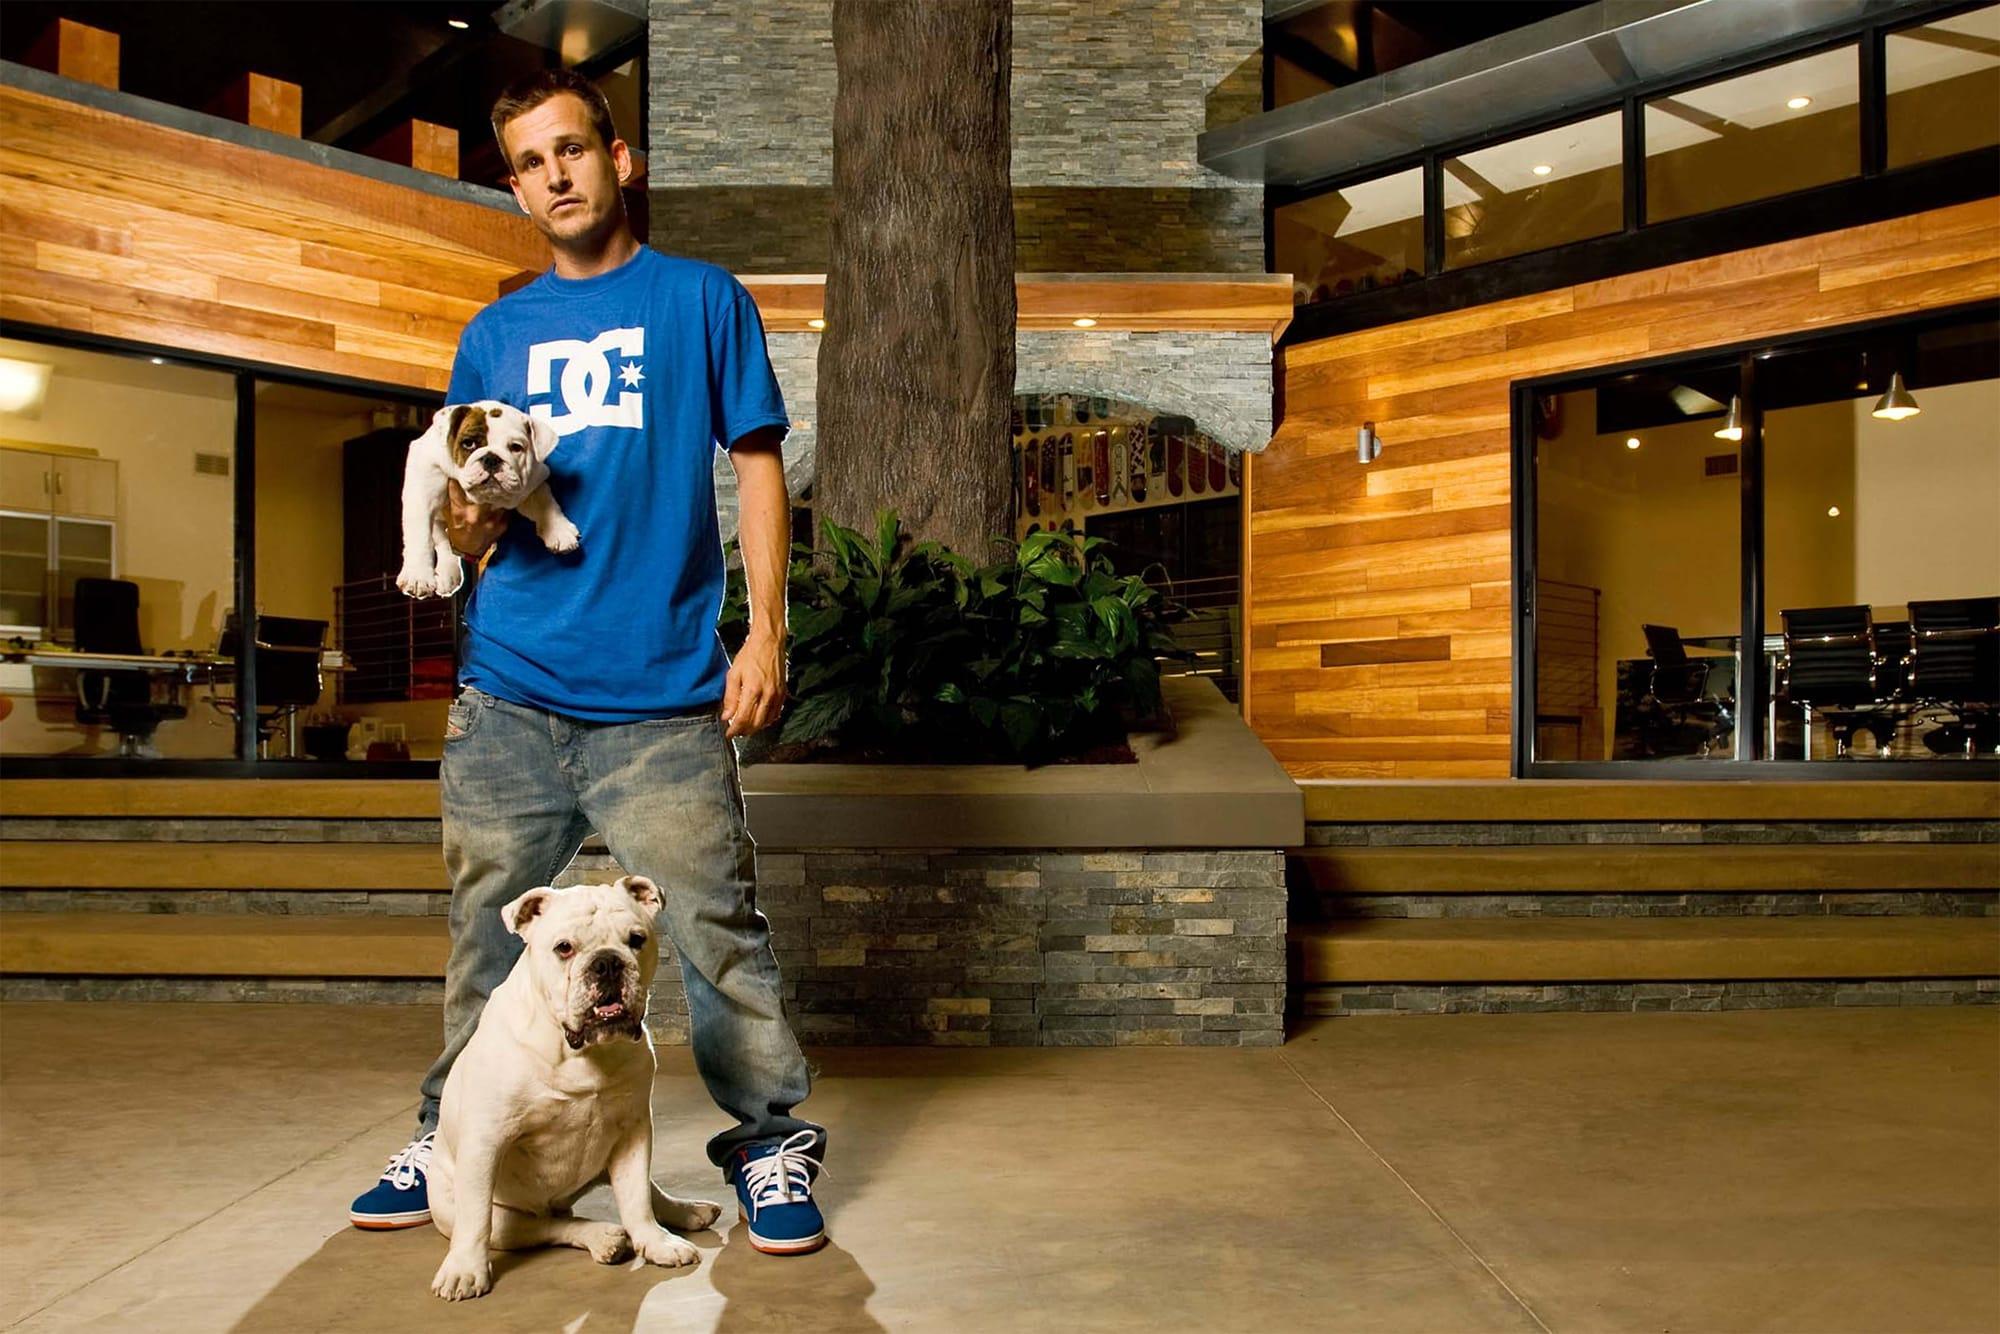 DC Shoes Cuts Ties With Rob Dyrdek